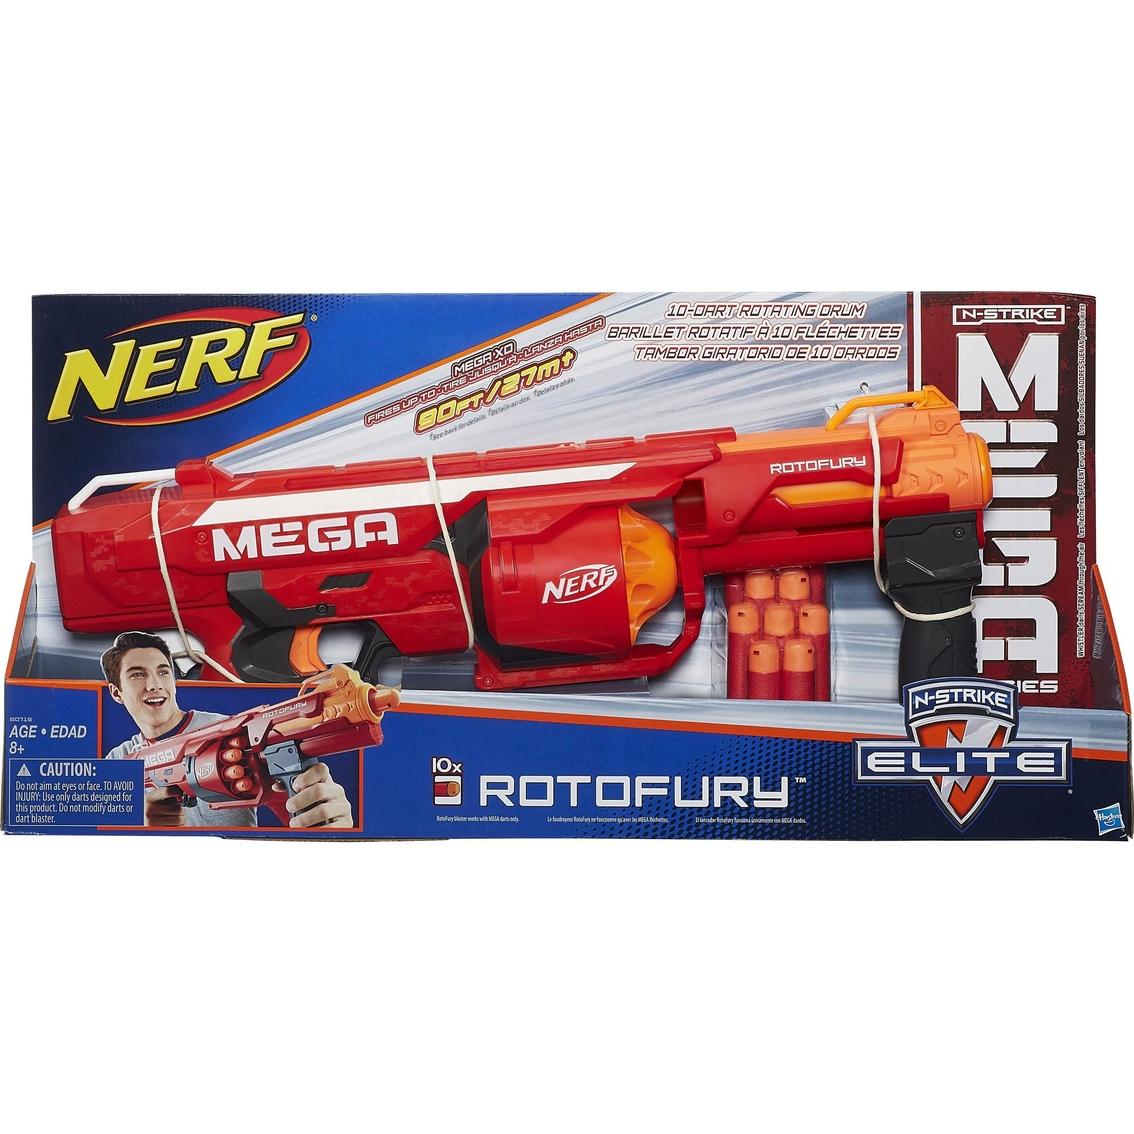 Nerf Target Toys For Boys : Nerf n strike mega series rotofury blaster toys shop